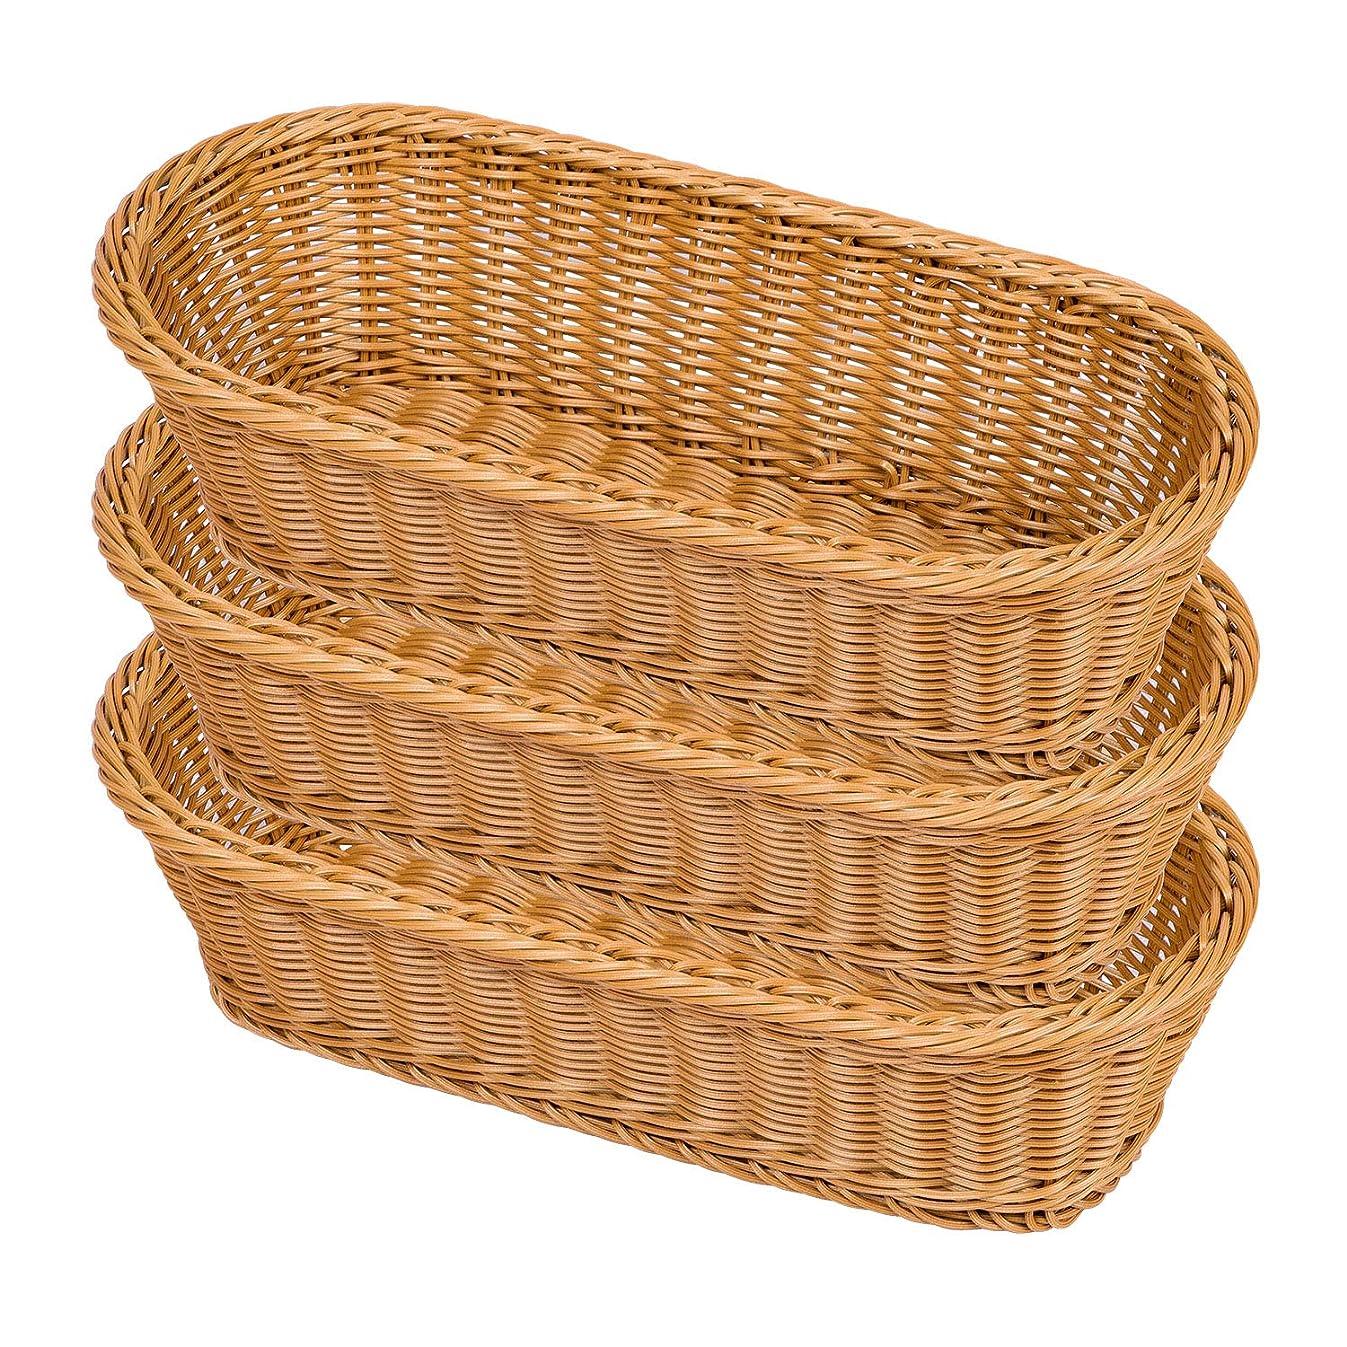 Natural Wicker Bread Basket,Long Woven Tabletop Food Fruit Multifunctional Sturdy Storage Serving Basket(3 PACKS)